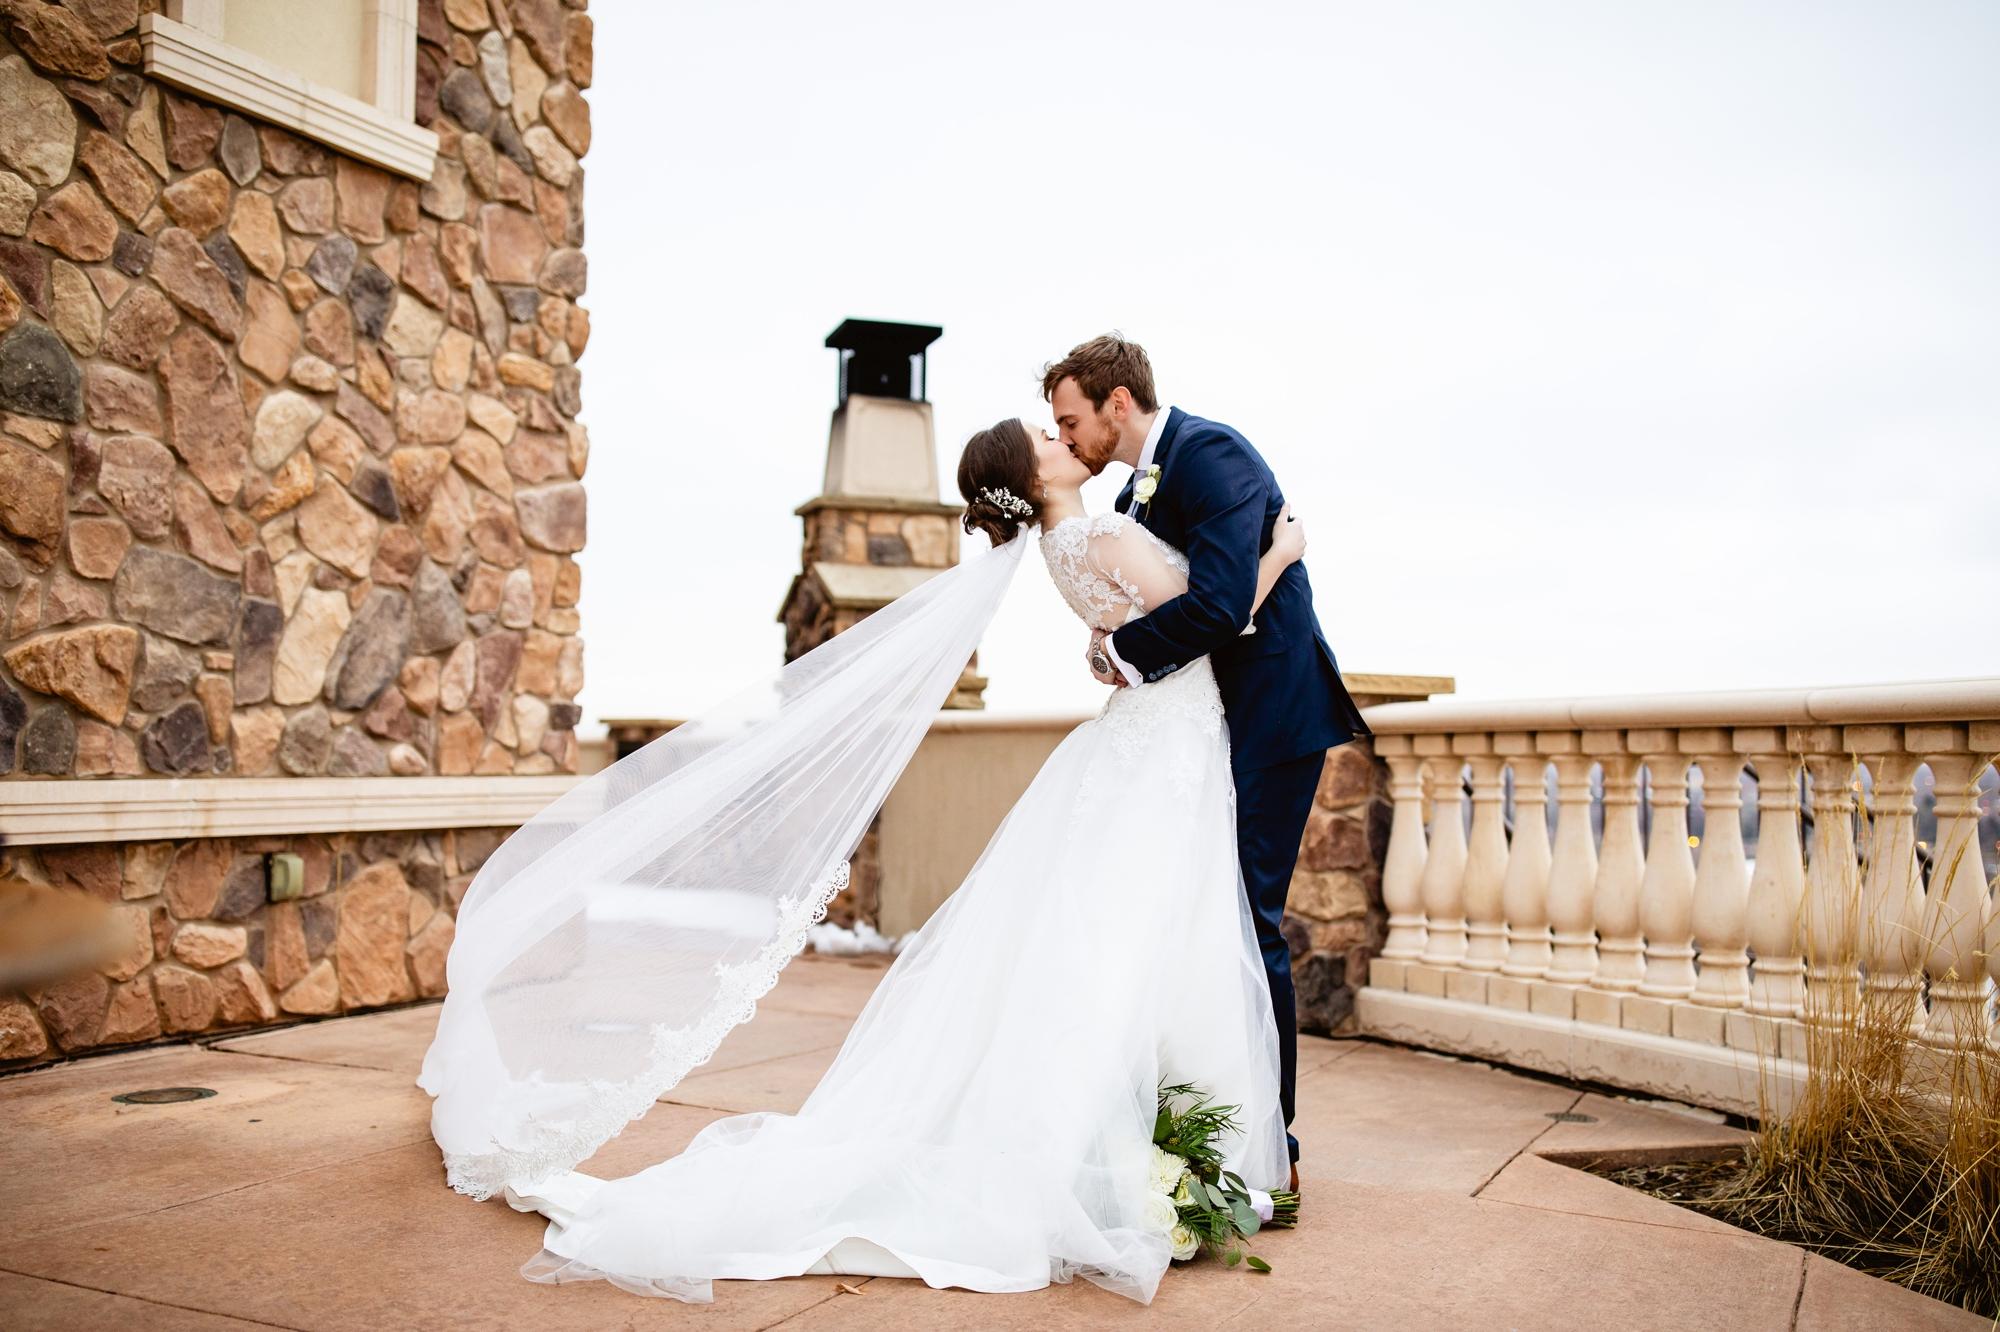 Pinery At The Hill Wedding Shove Chapel Wedding Colorado Springs Wedding Photo In 2020 Denver Wedding Venue Denver Wedding Photography Colorado Wedding Photography